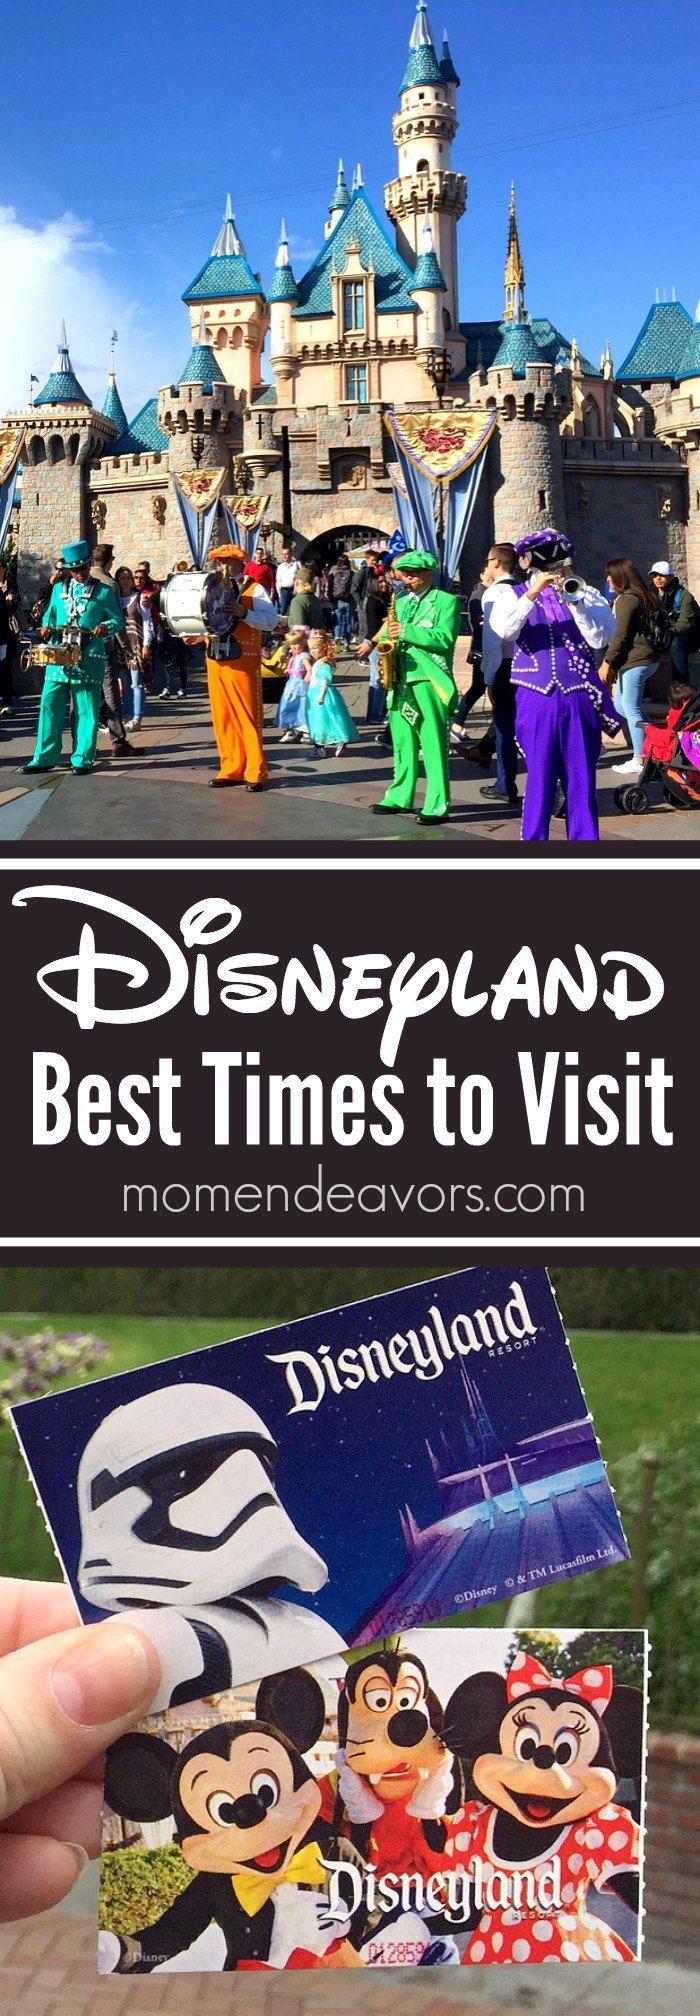 Disneyland Trip Planning - Best Times to Visit the Disneyland Resort!